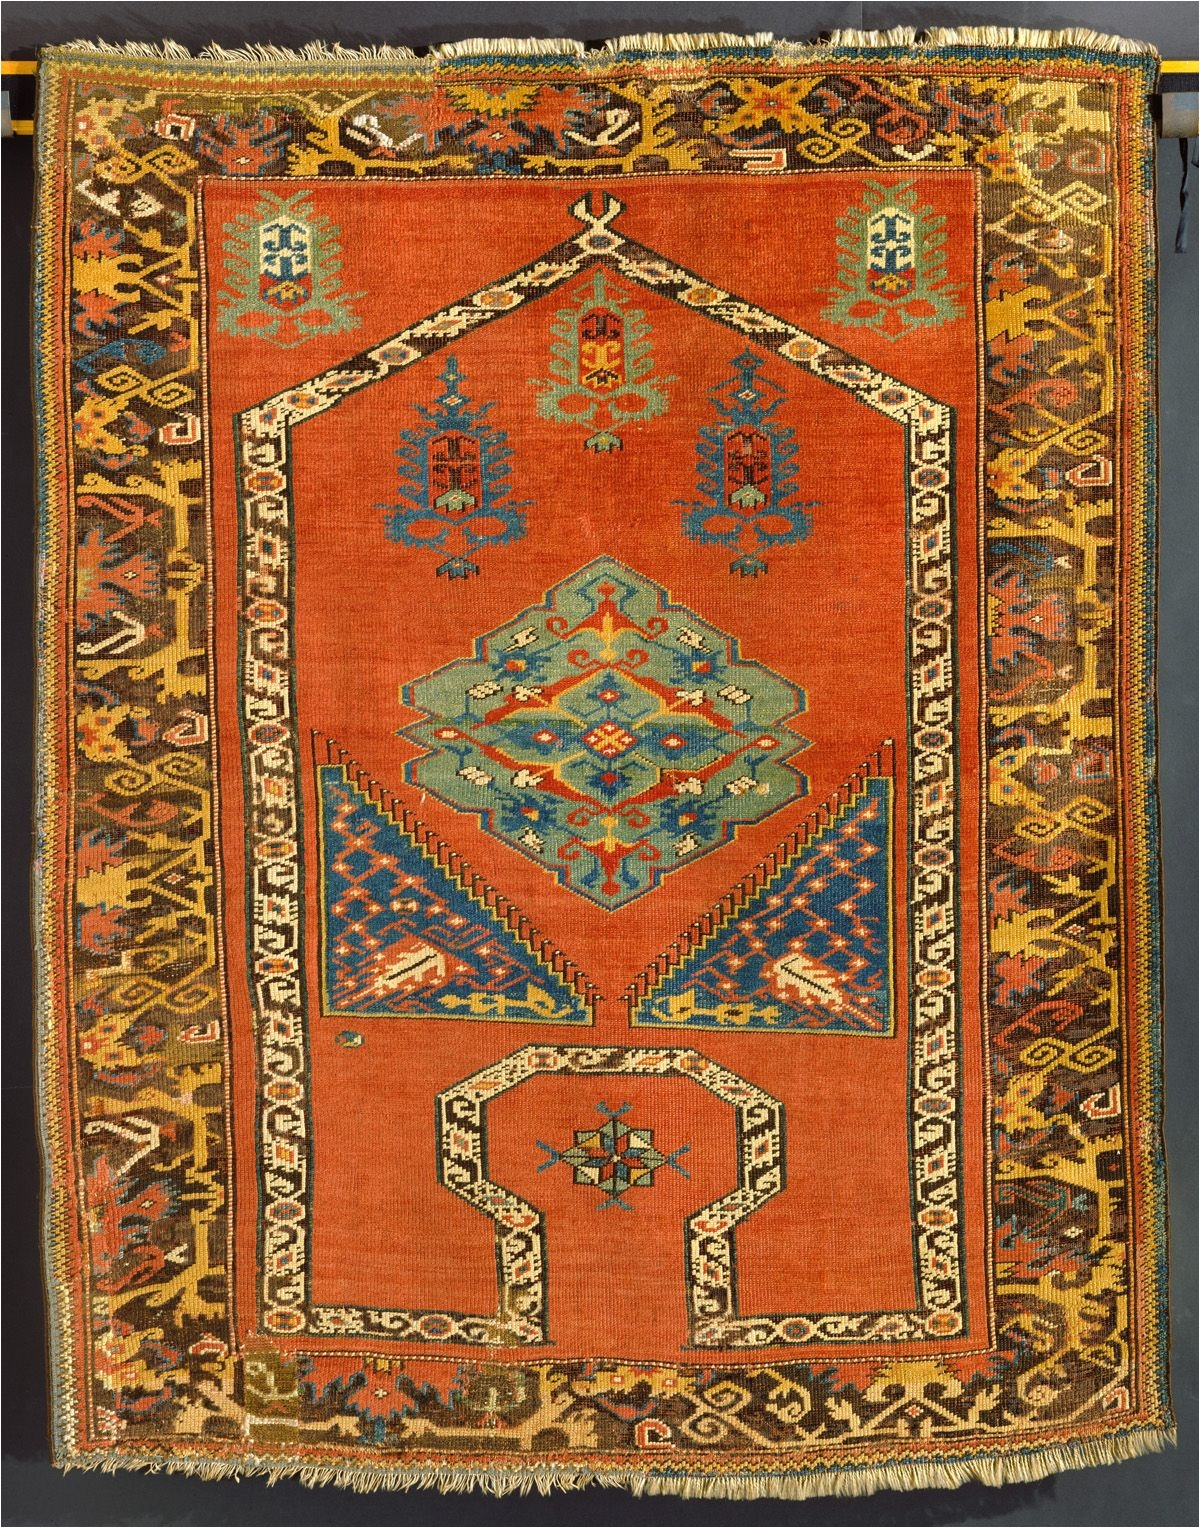 Types Of oriental Rugs Ottoman Carpets In the Xvi Xvii Centuries 16 17th Centuries